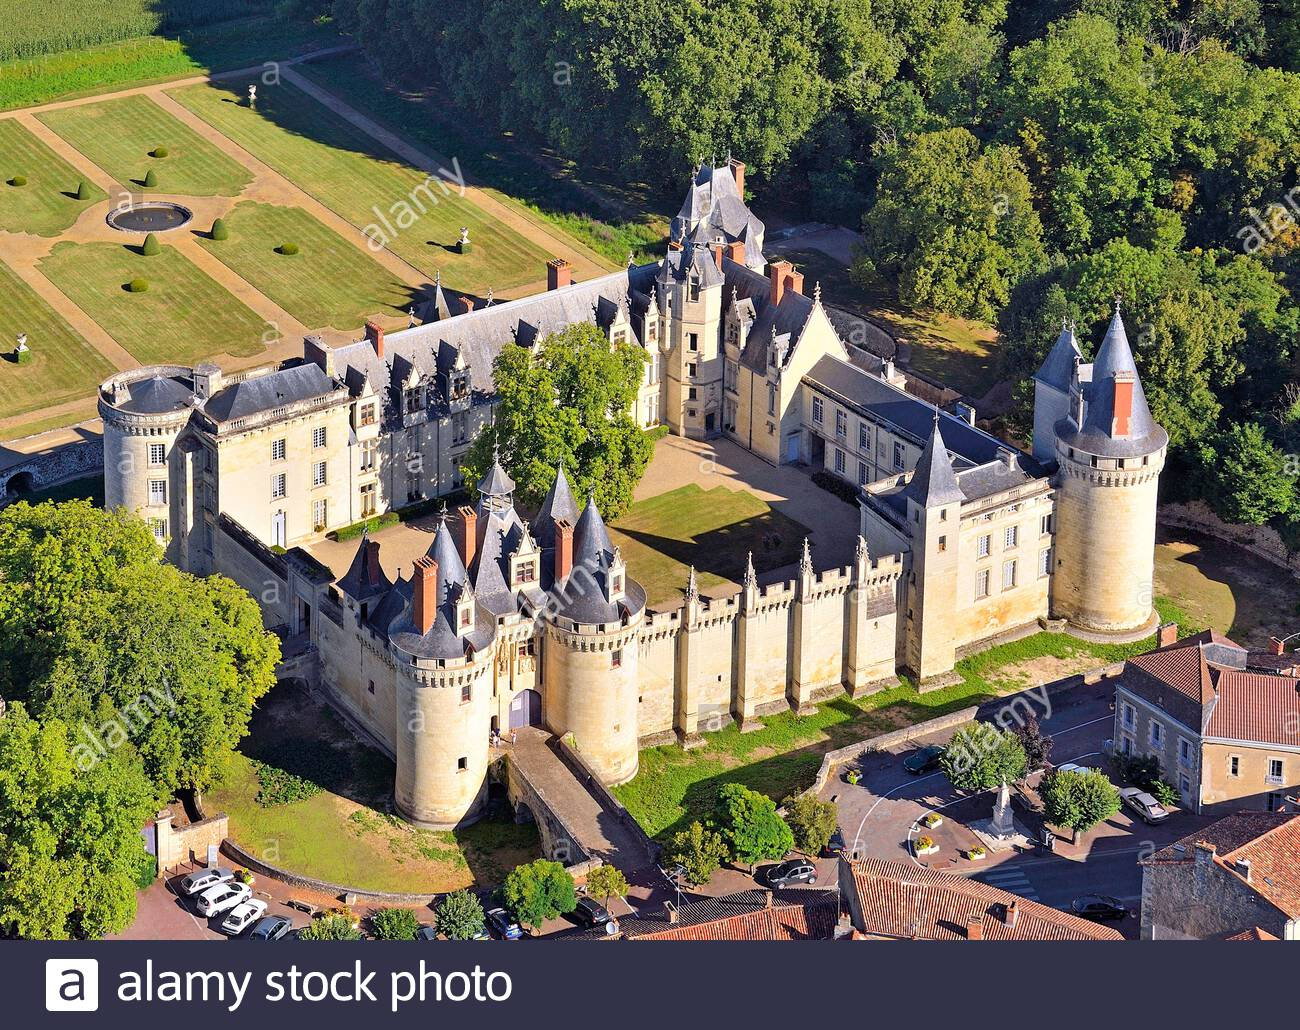 france-vienne-dissay-the-castle-aerial-view-2B4B5FN.jpg